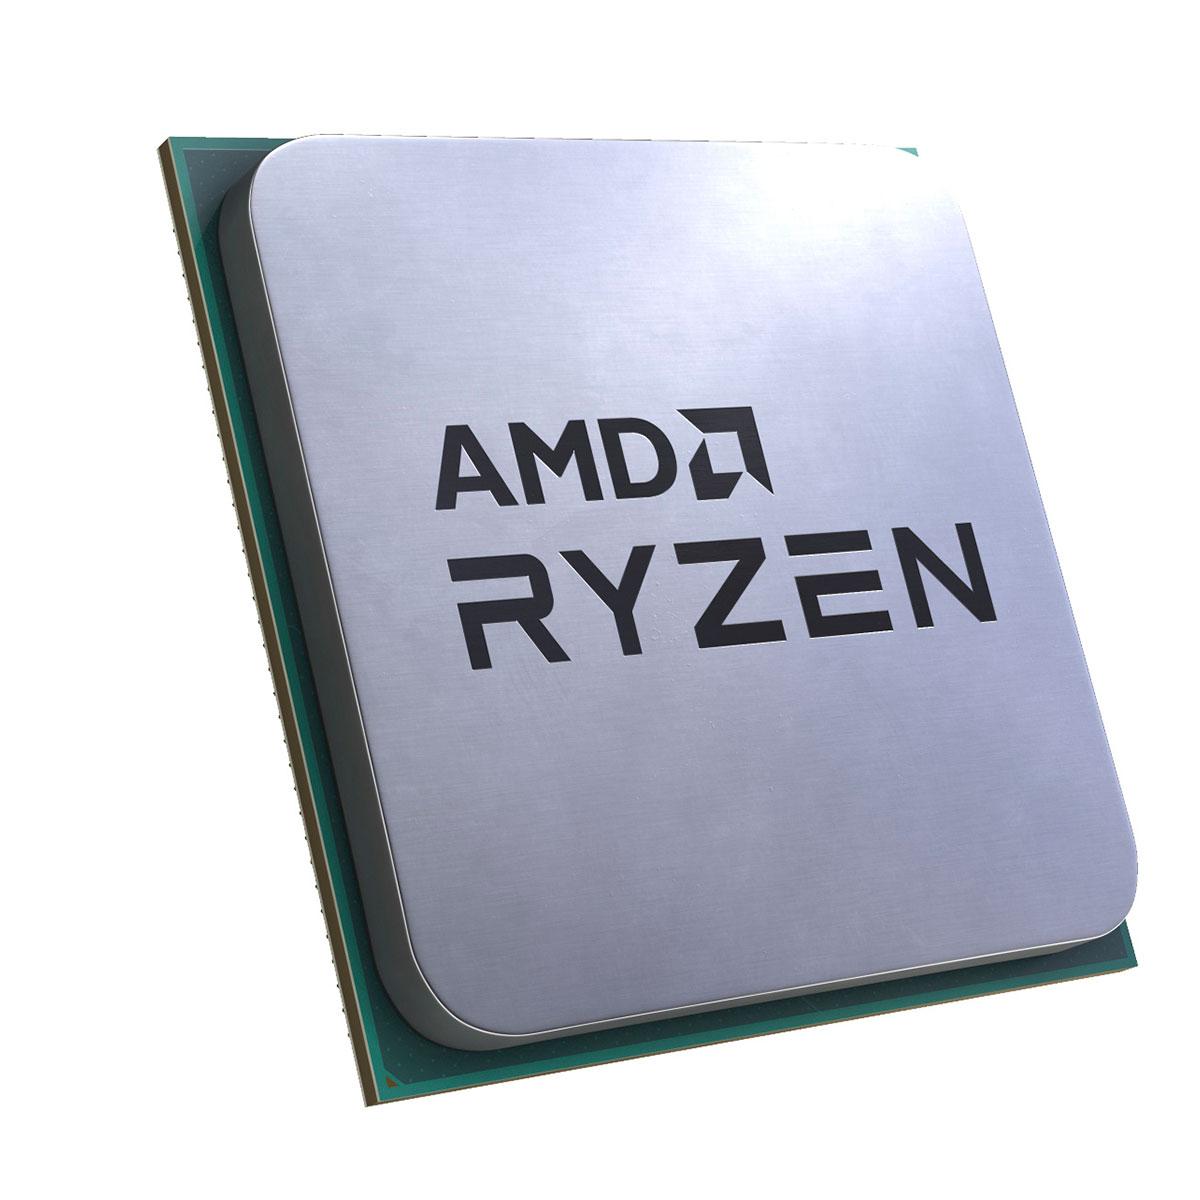 Processador AMD Ryzen 5 5600X, 3.7GHz (4.6GHz Turbo) 6-Cores/12T 35MB, Socket AM4 - 100-100000065BOX